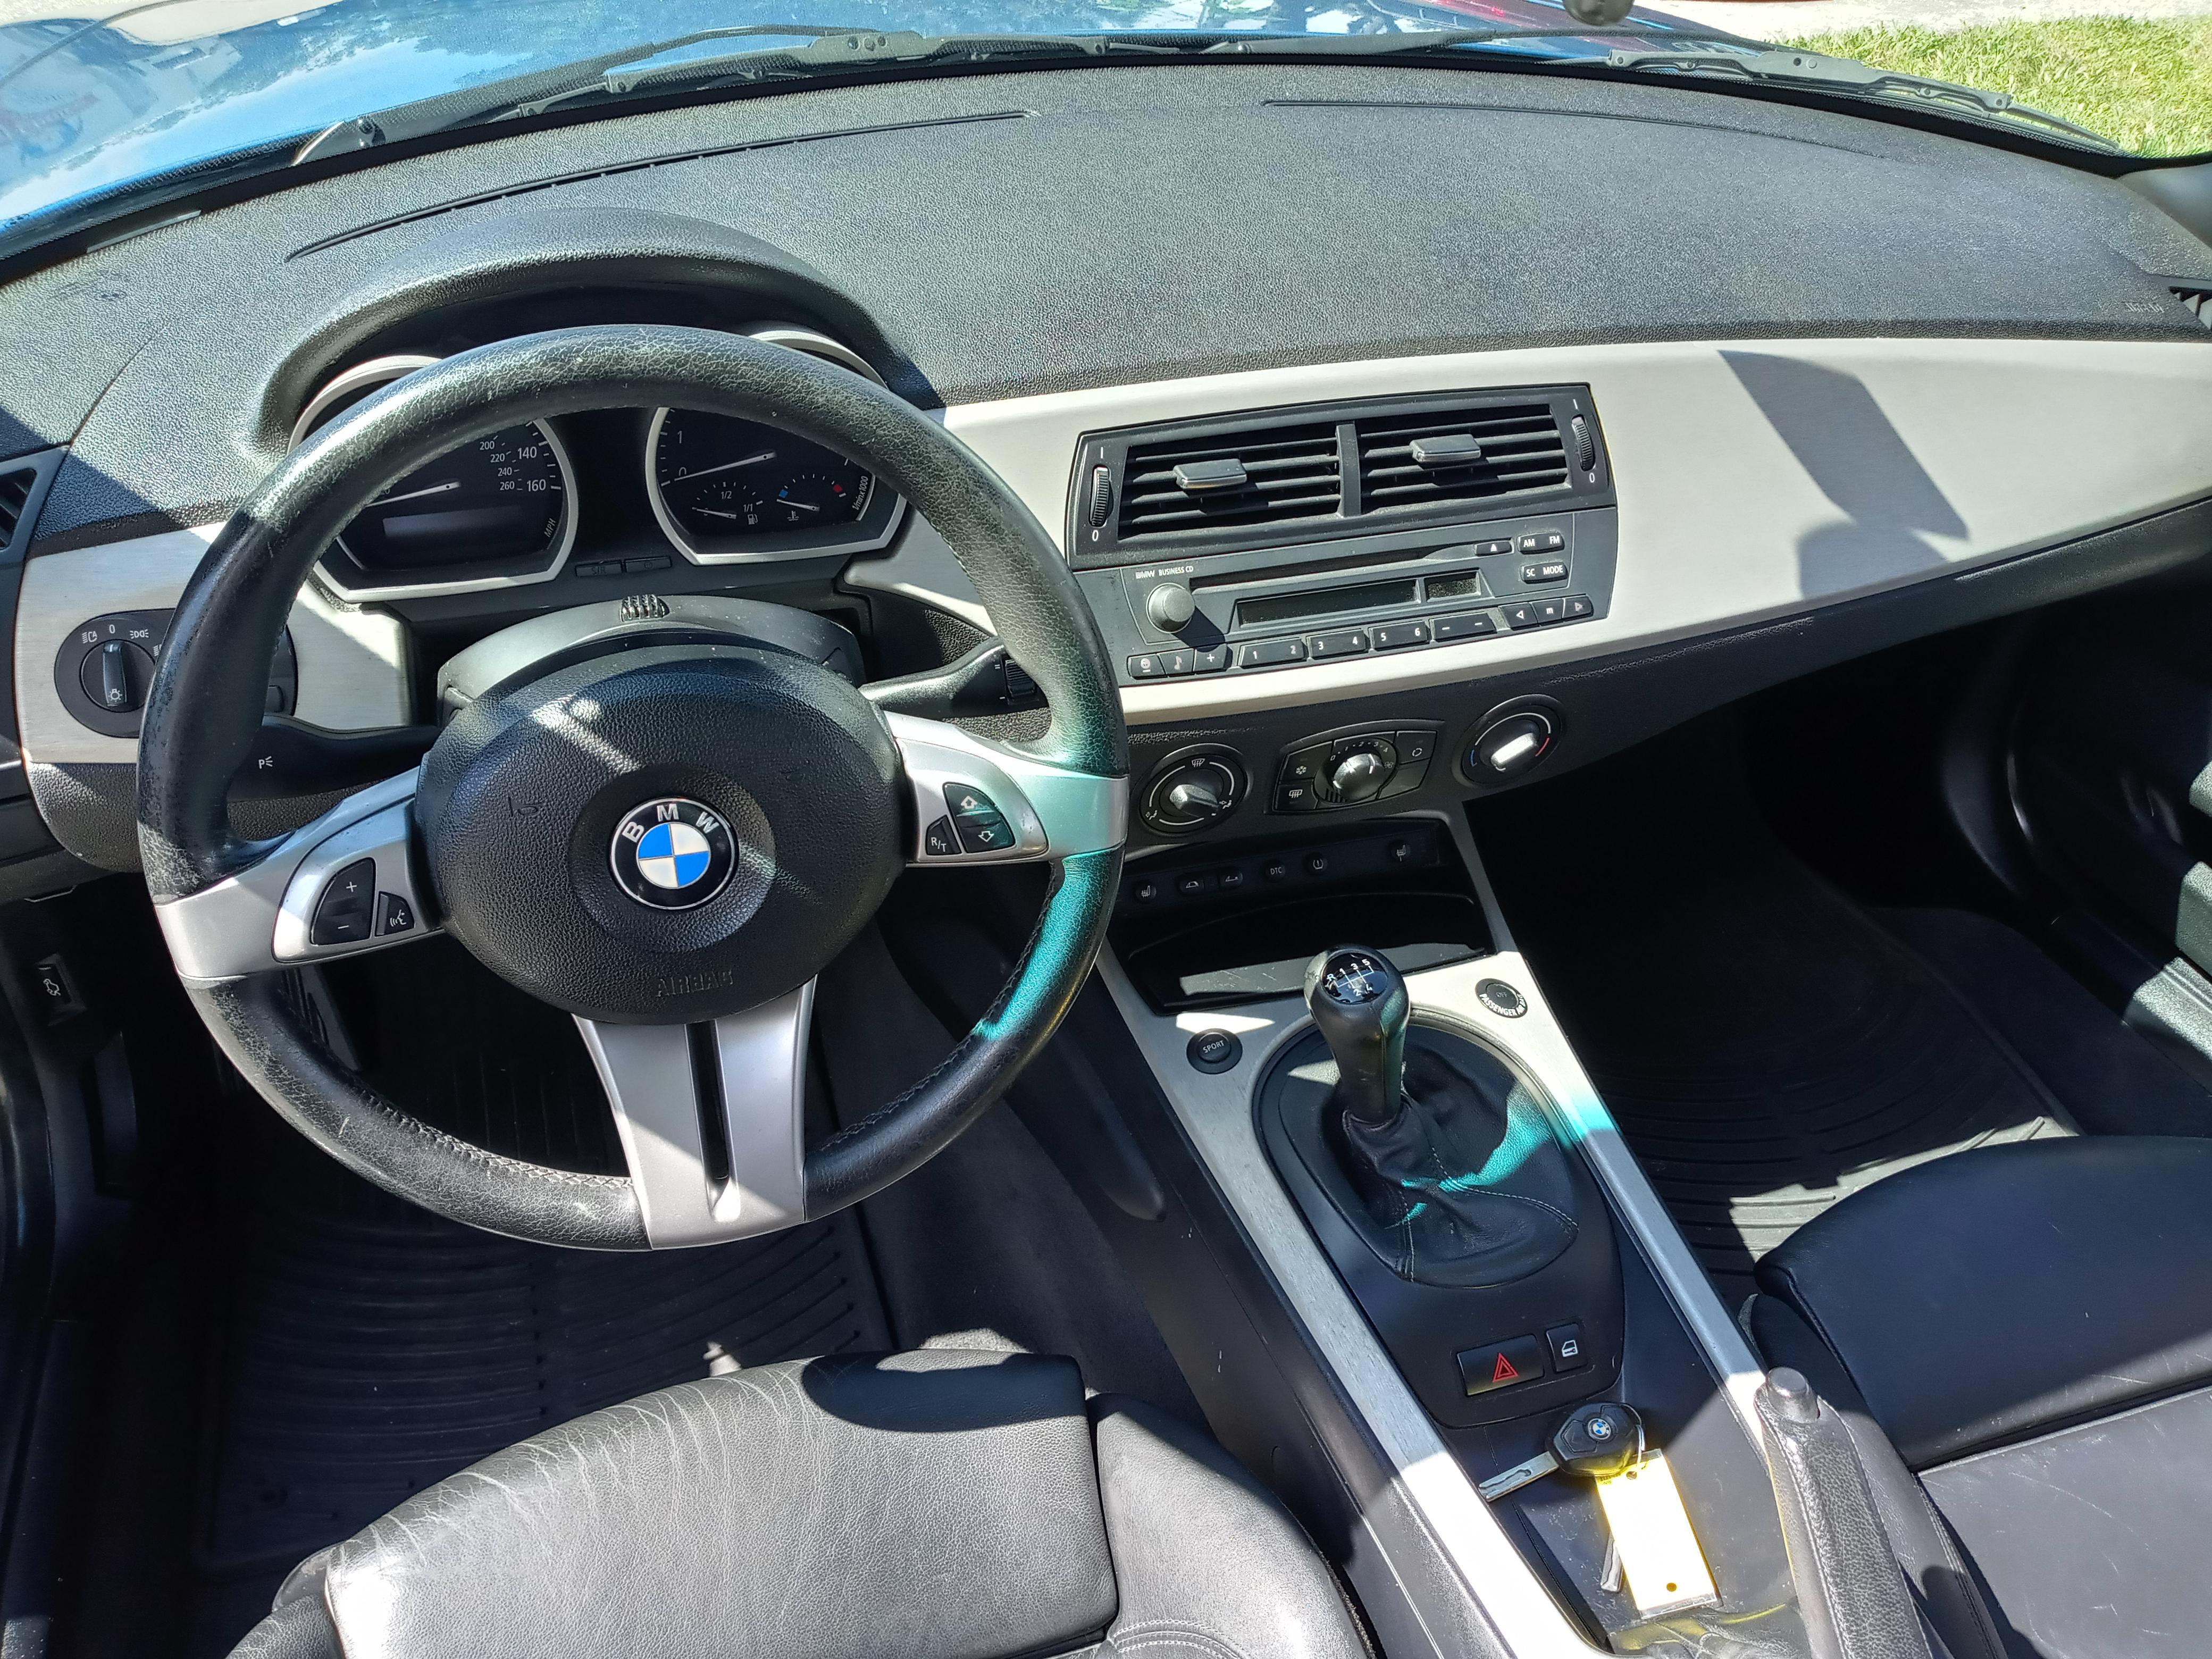 9th Image of a 2005 BMW Z4 2.5I